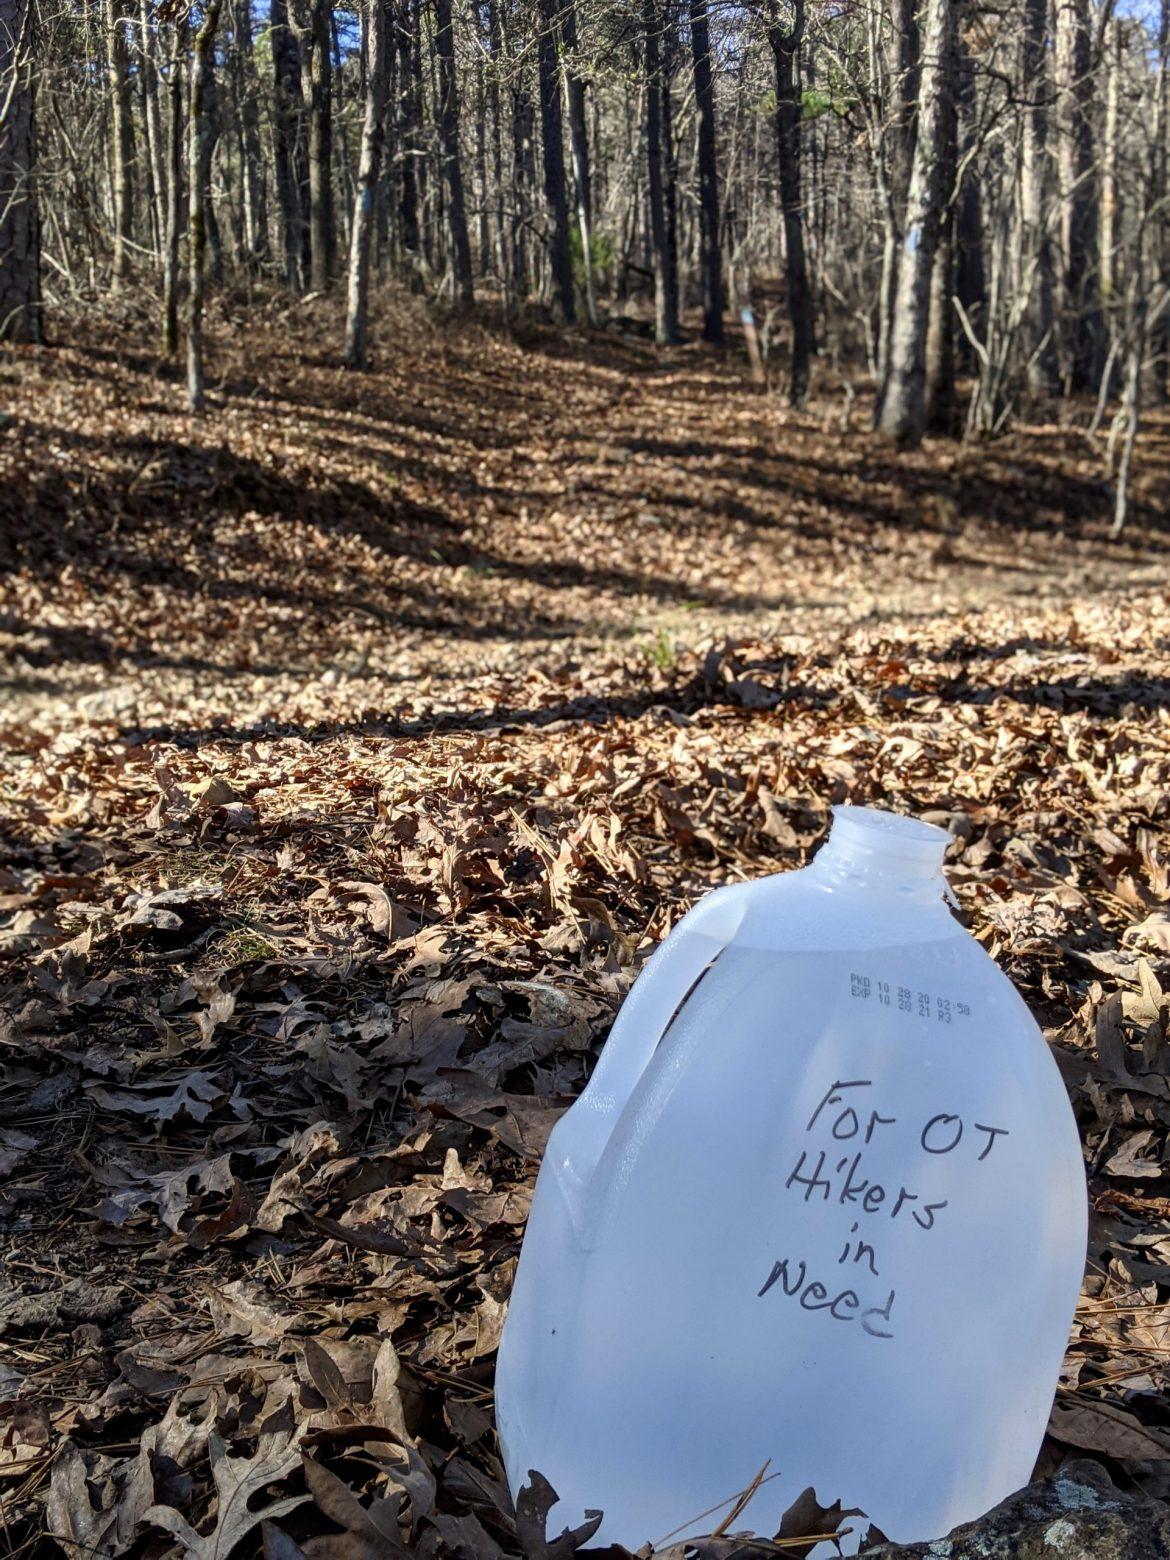 Trail Angels on the OT